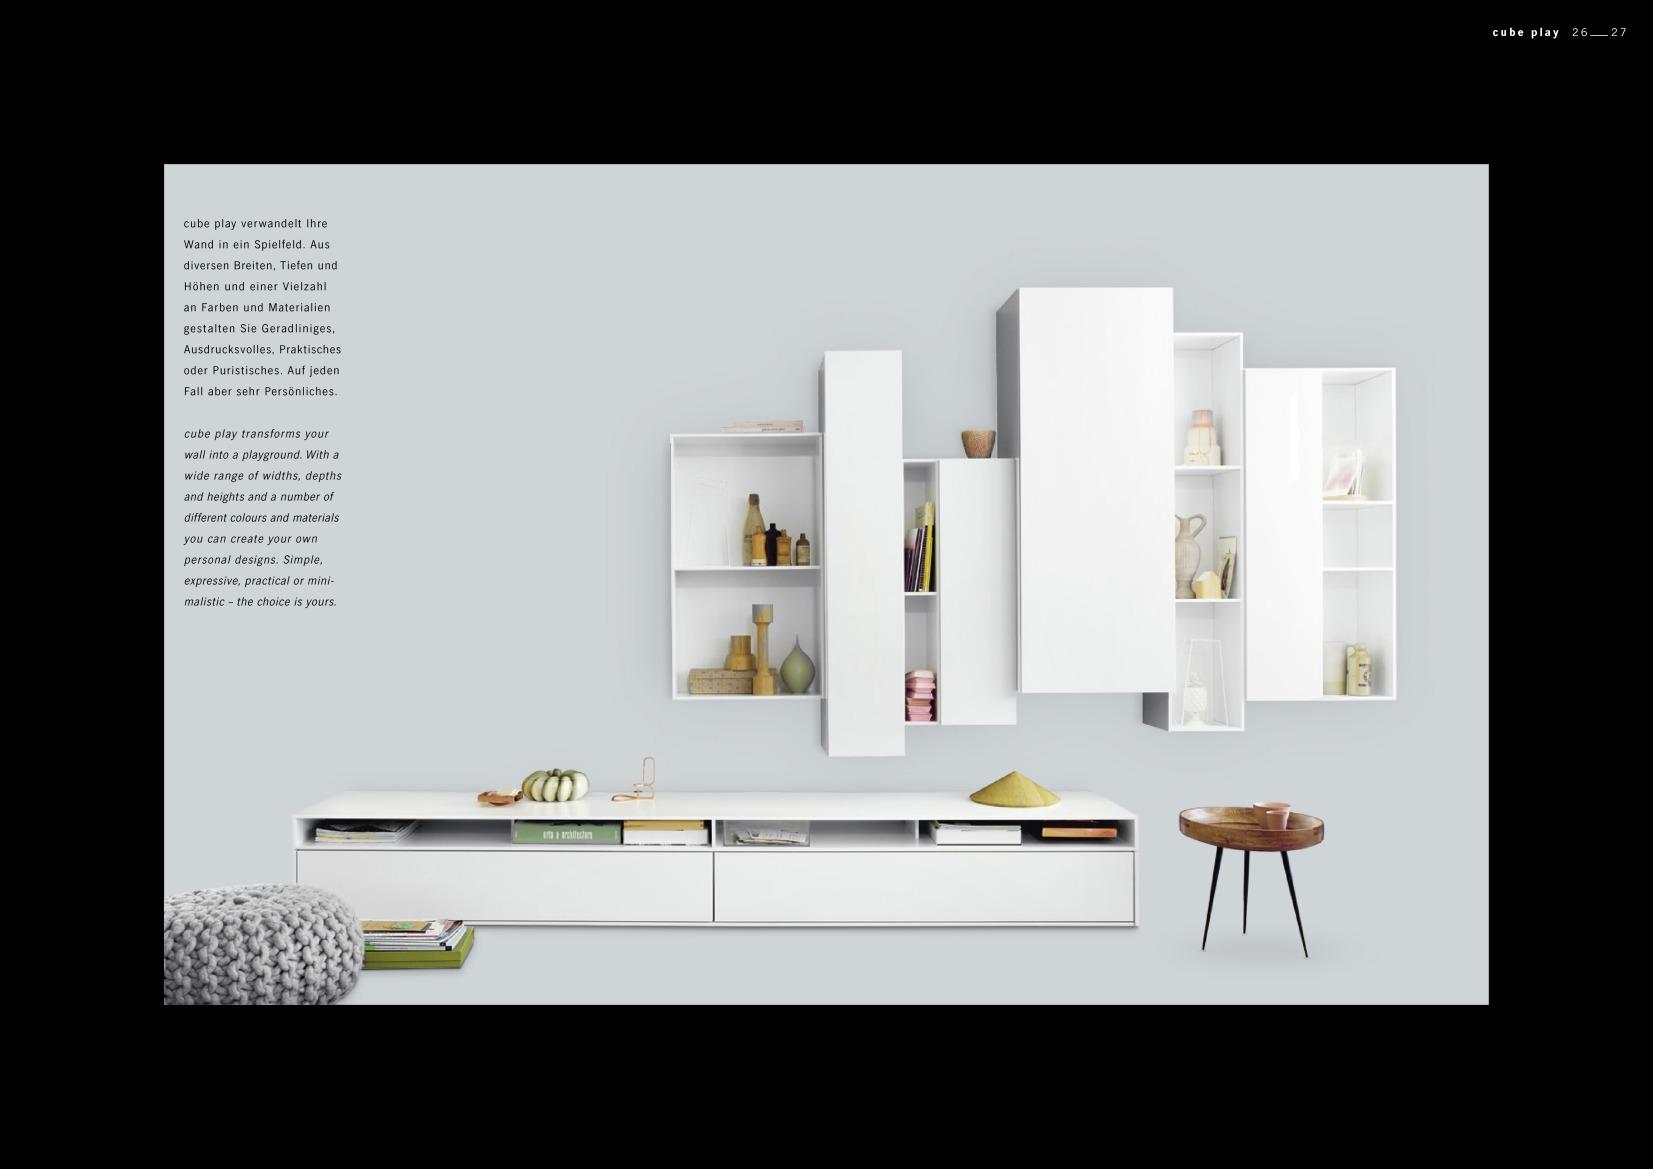 interluebke lookbook 2017 gs 12 m bel weber neustadt landau karlsruhe. Black Bedroom Furniture Sets. Home Design Ideas